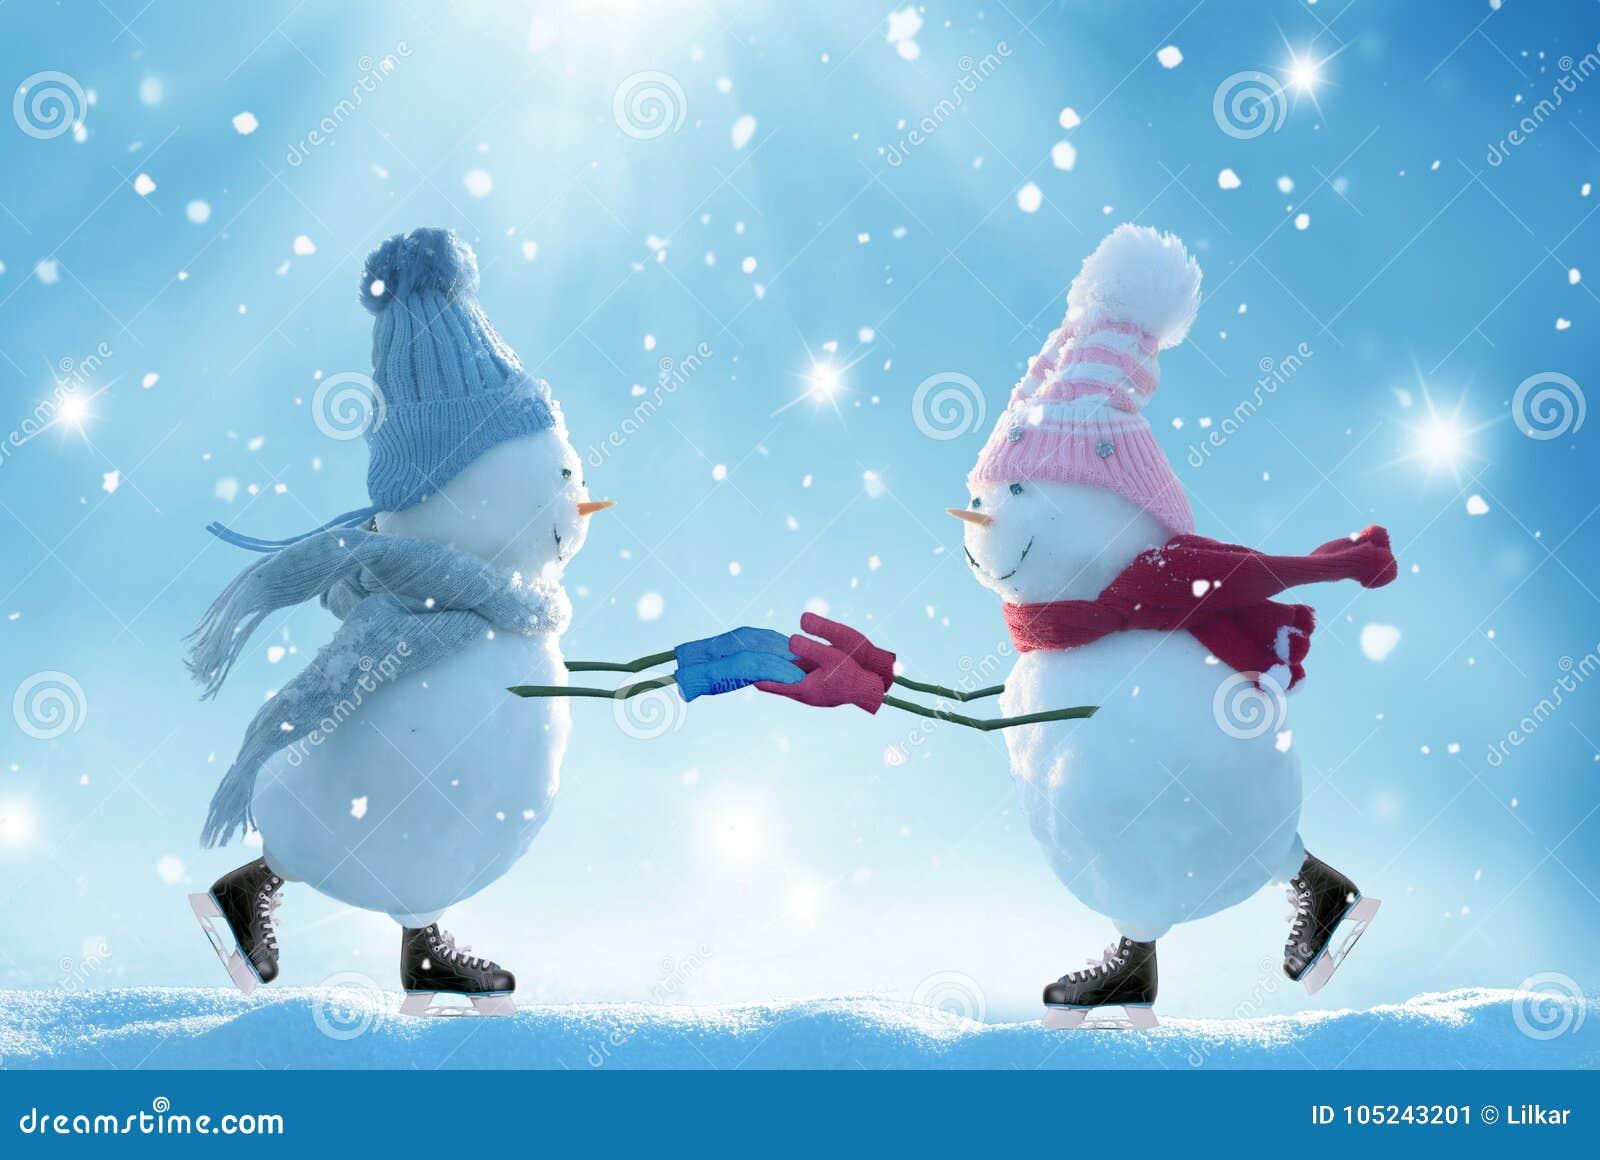 Two ice skating snowmen